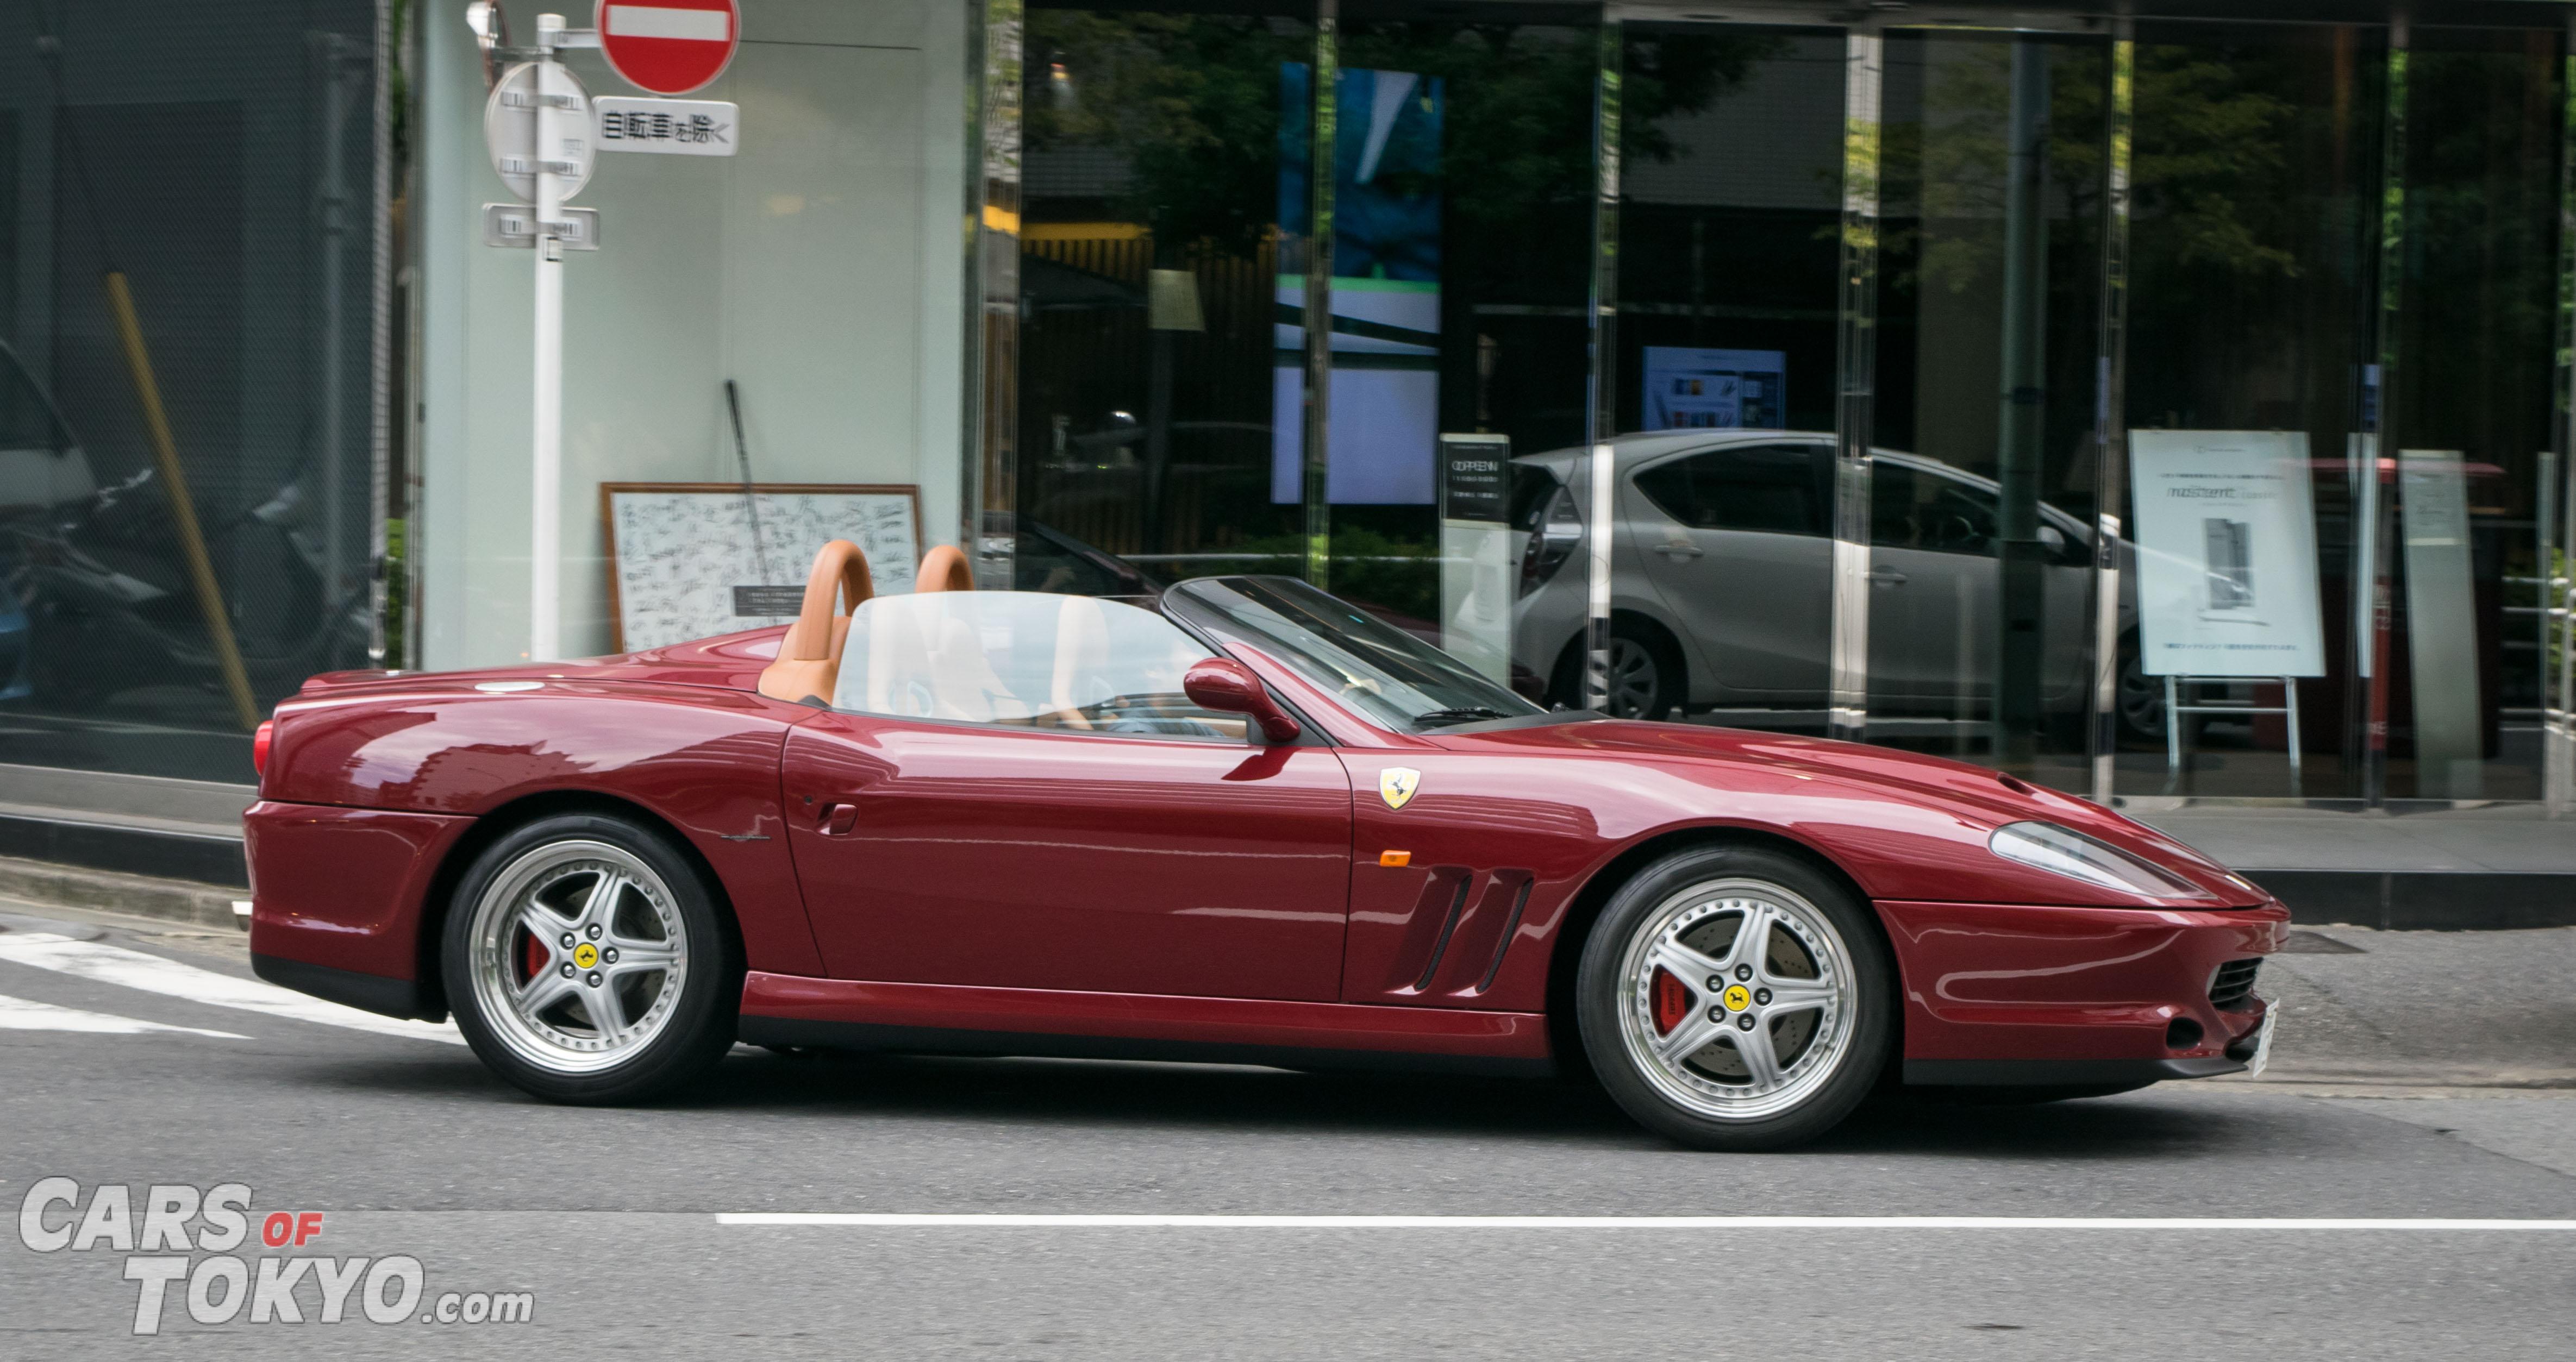 Cars of Tokyo Clean Ferrari 550 Barchetta